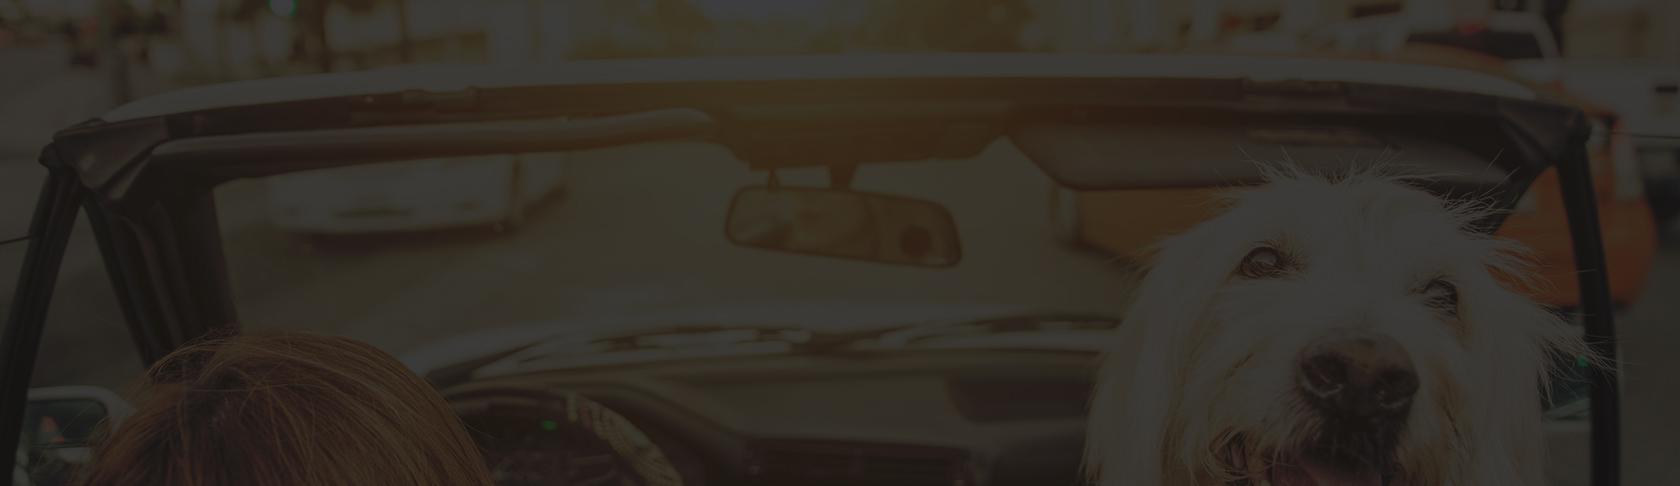 dog-car-banner.jpg